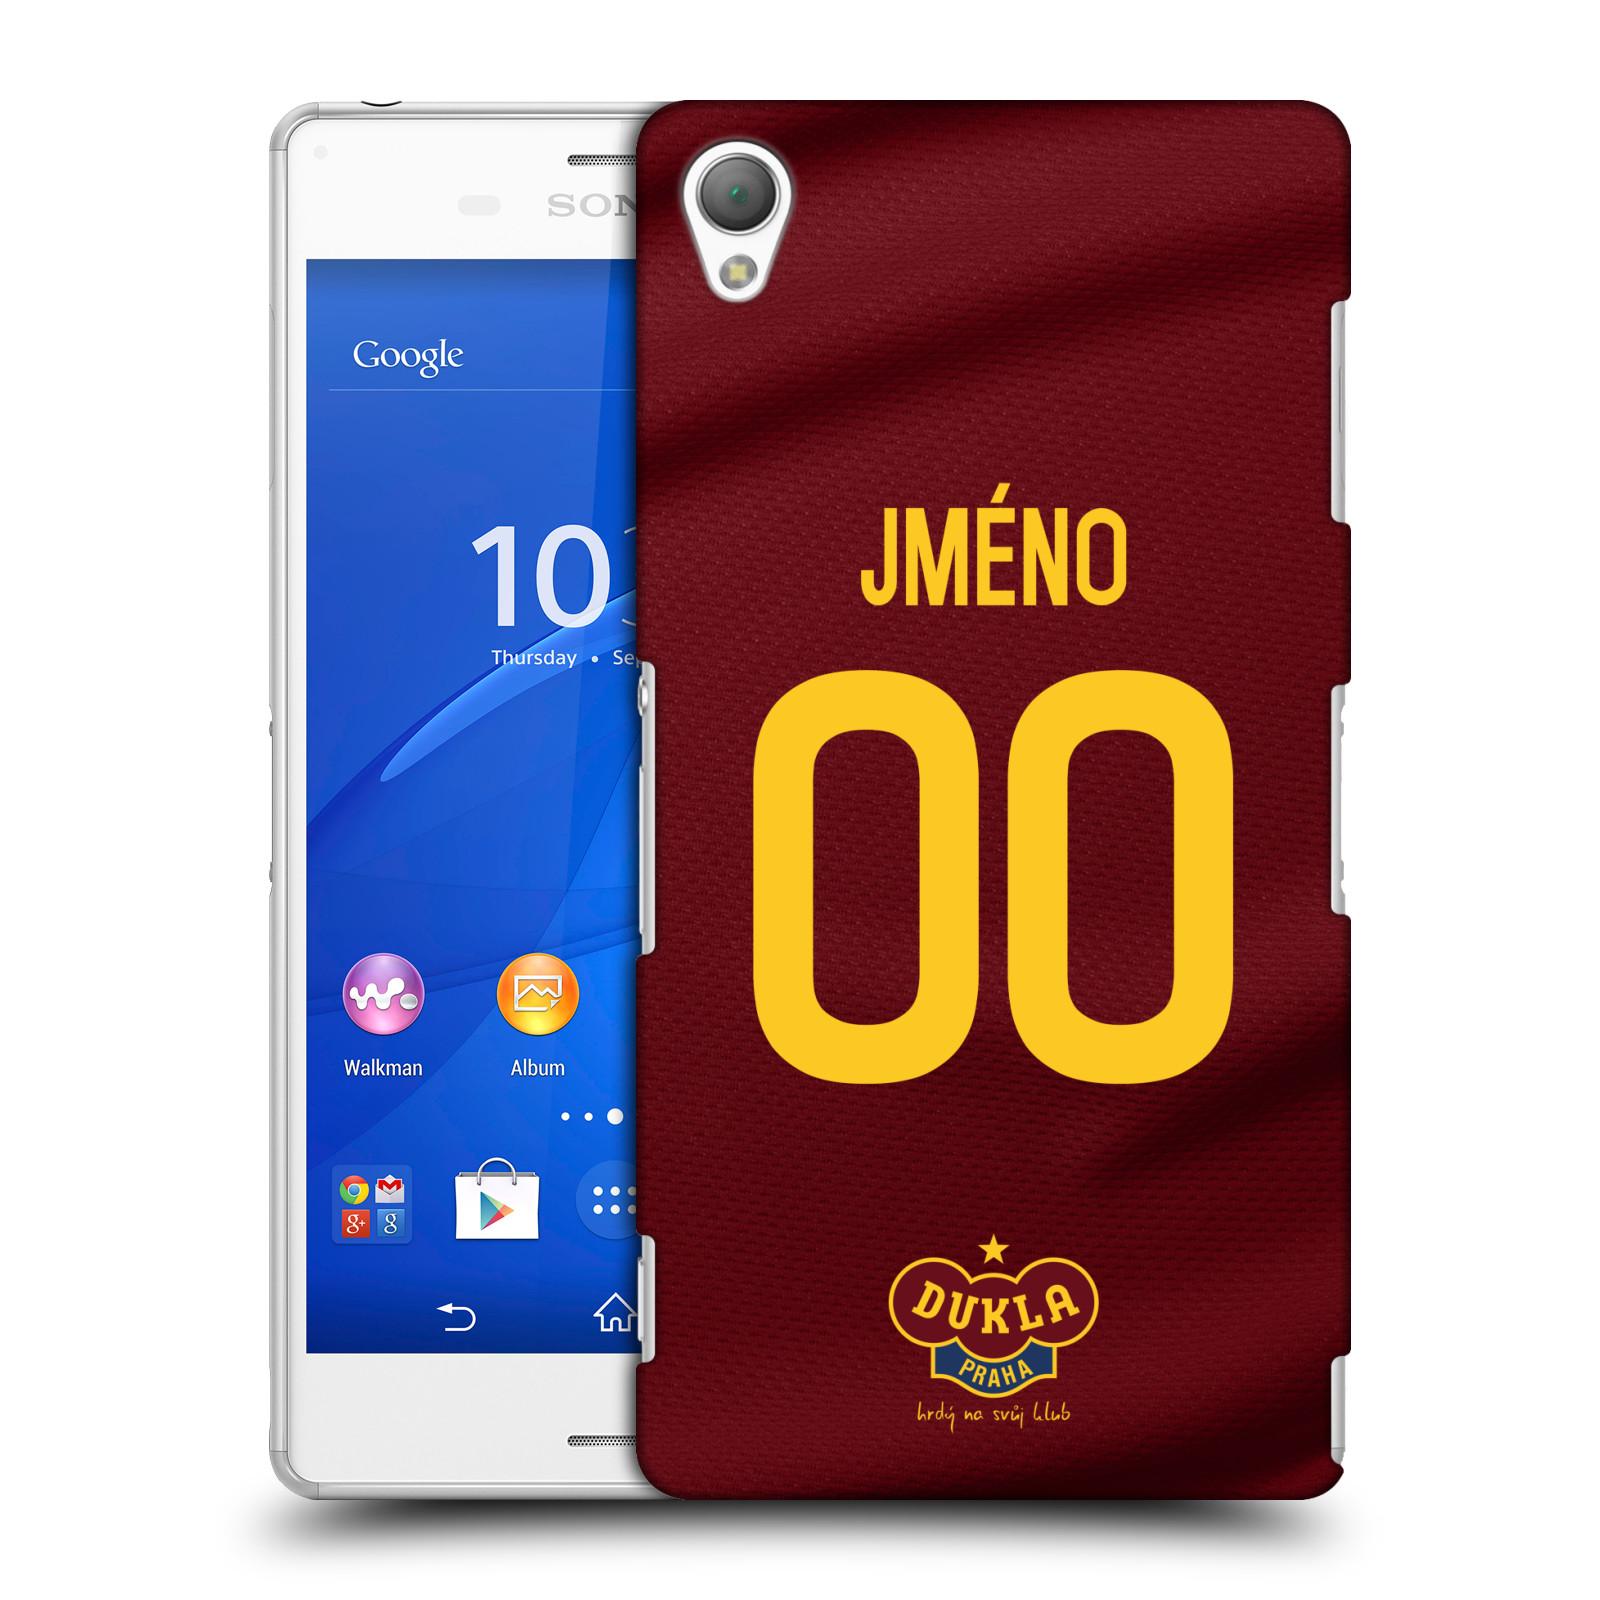 Plastové pouzdro na mobil Sony Xperia Z3 D6603 - FK Dukla Praha - dres s vlastním jménem a číslem